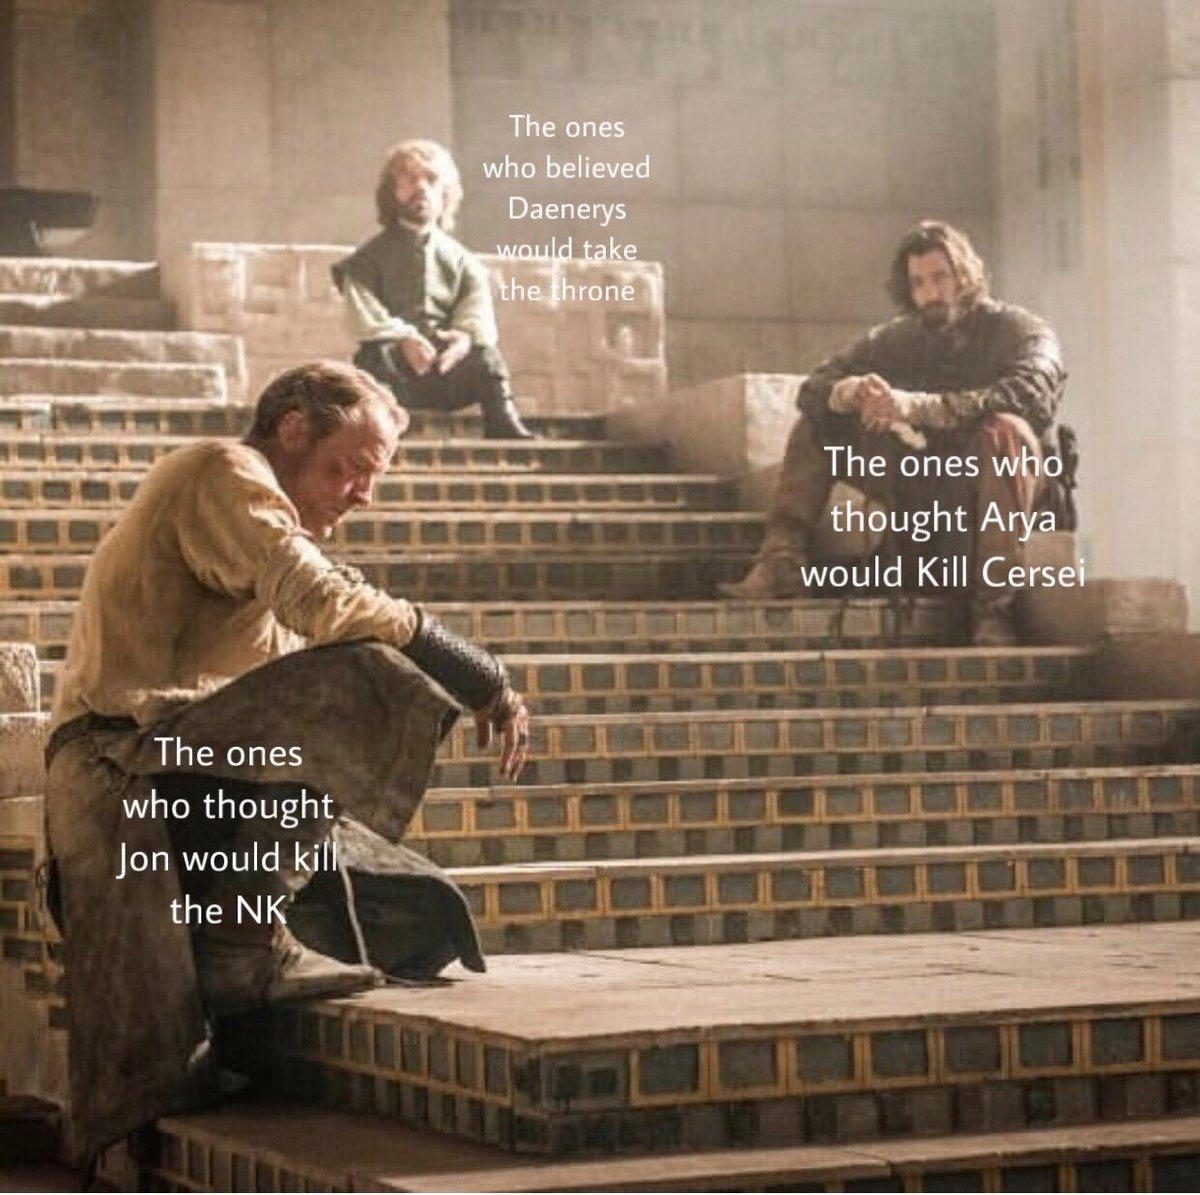 RT @amidalastark: game of thrones season 8 (2019): https://t.co/xdwKXkRbWC